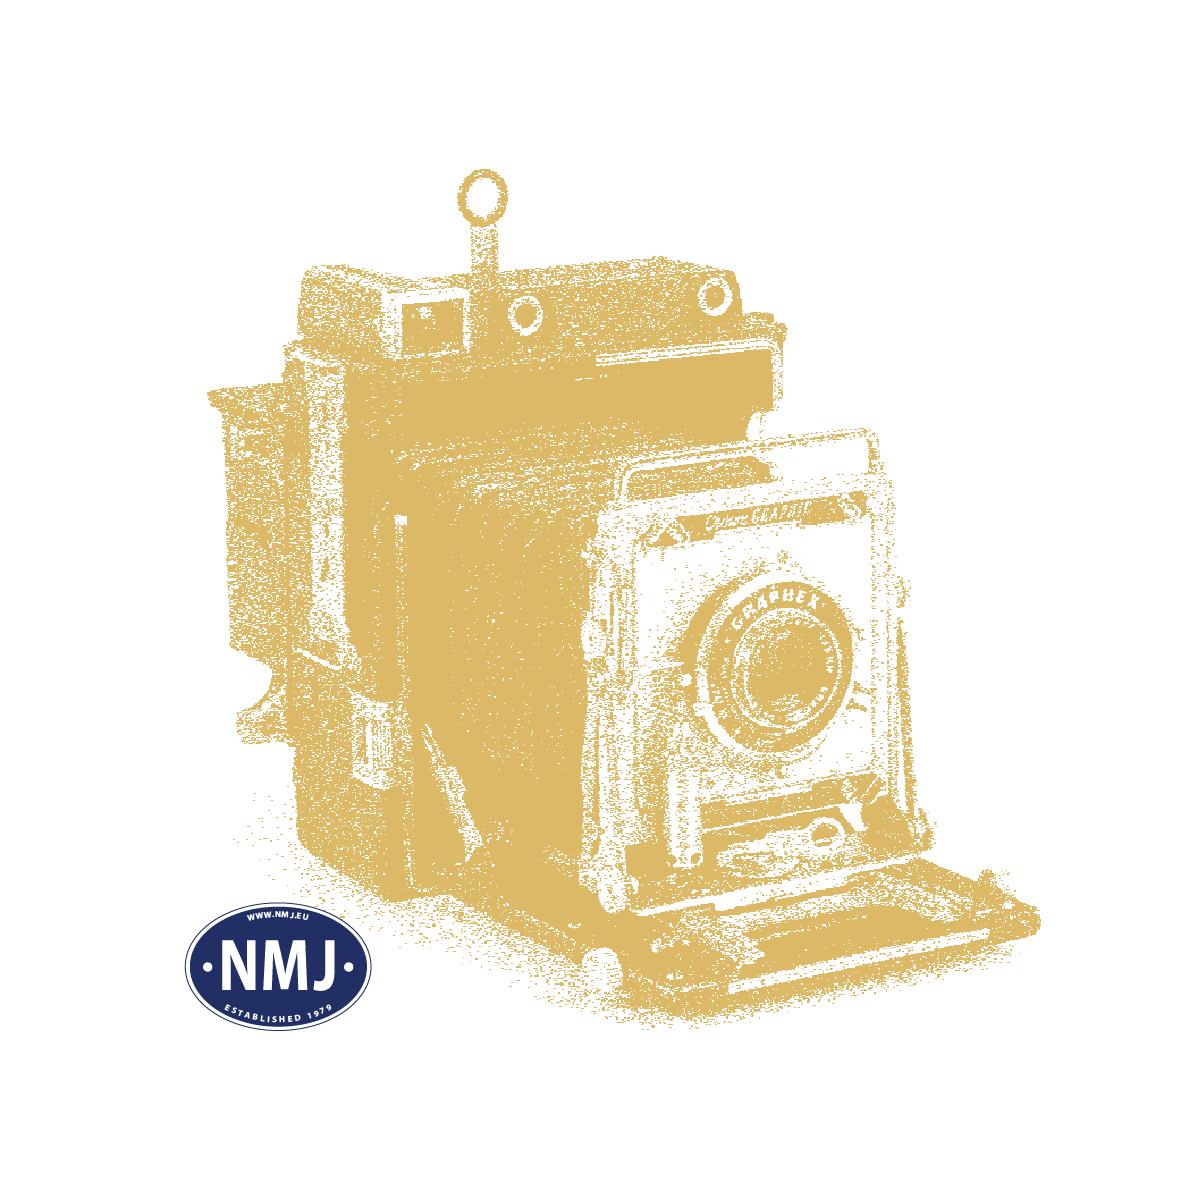 NMJT90209 - NMJ Topline MAV M61.007, DCC m/ Lyd